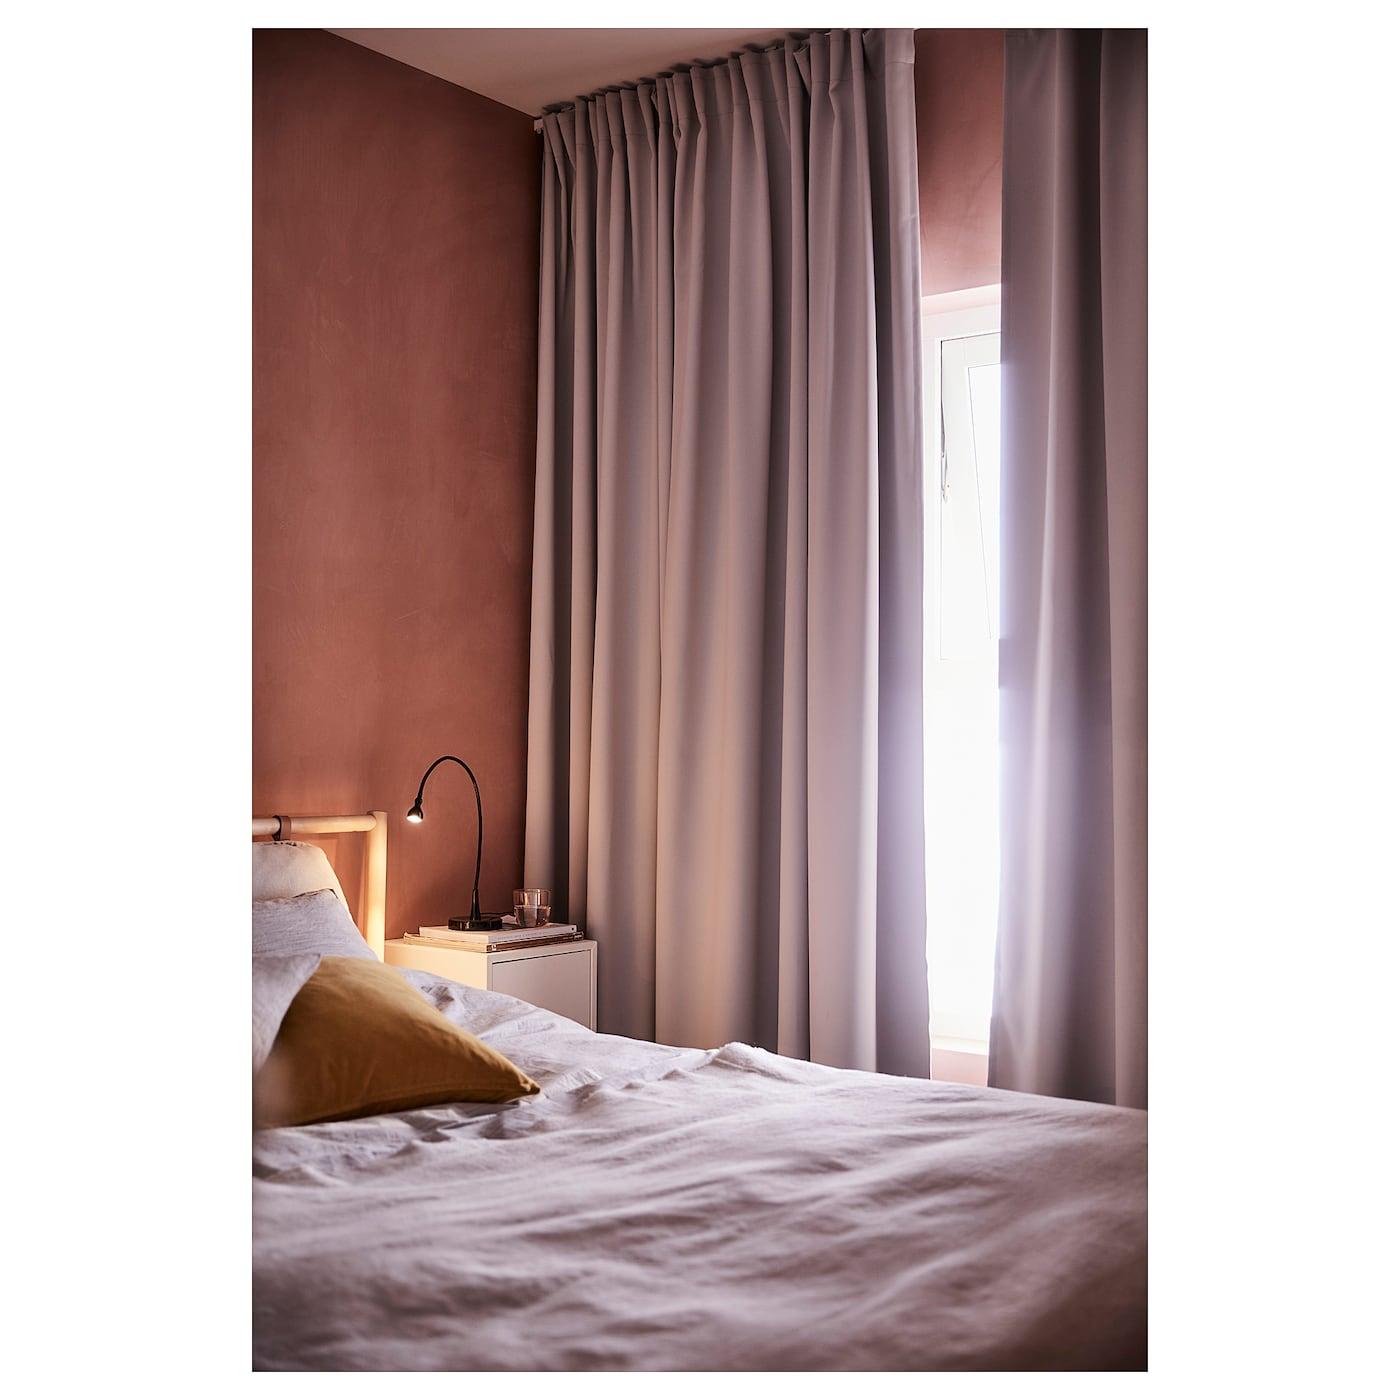 Majgull Room Darkening Curtains 1 Pair Light Grey 145x250 Cm Ikea